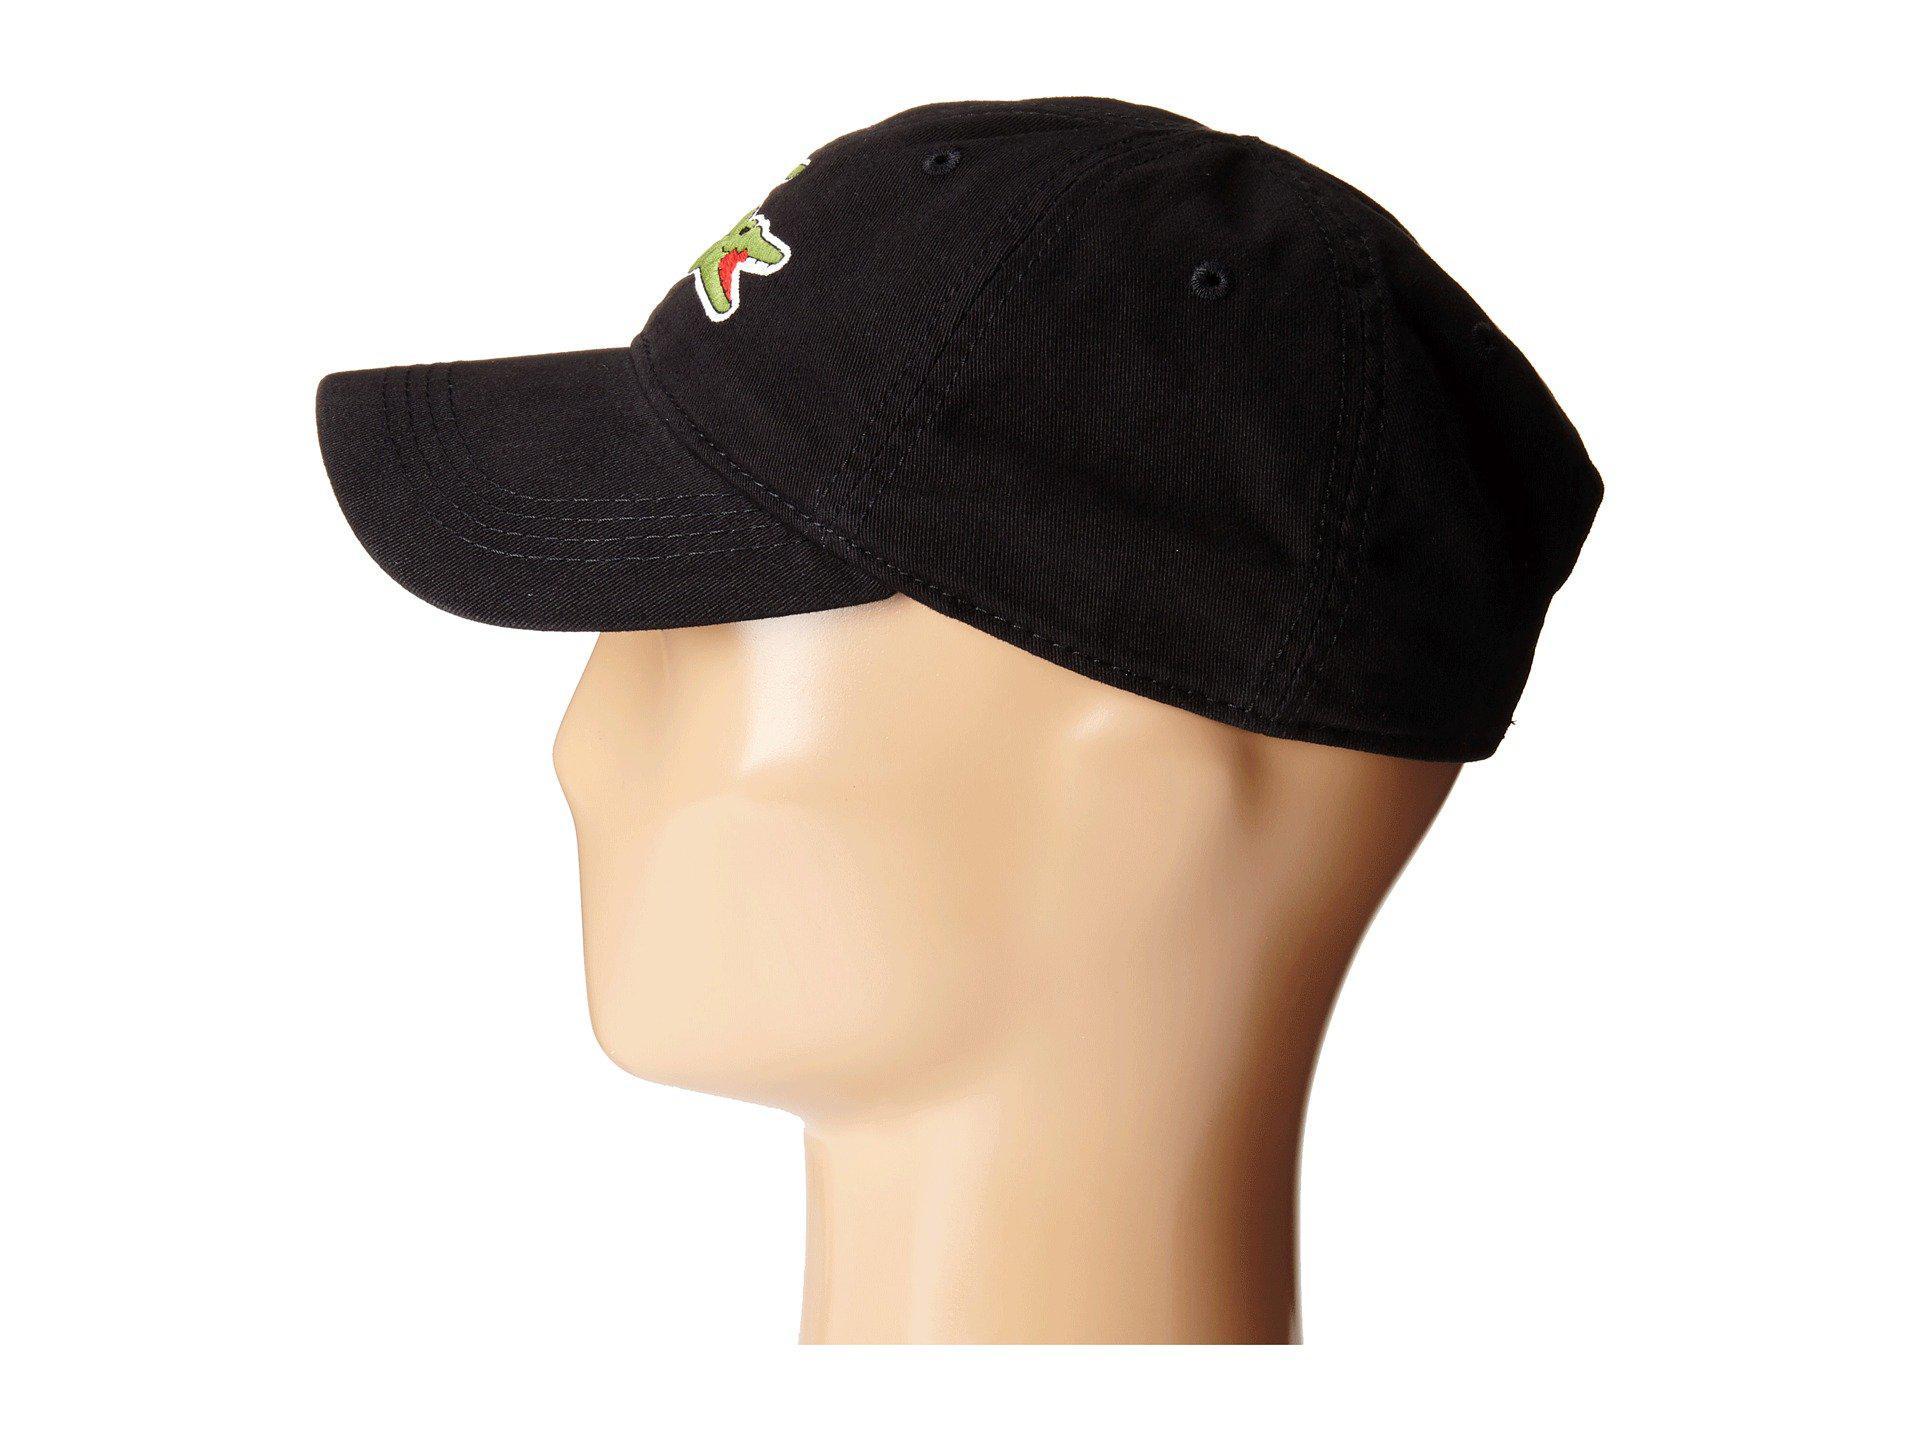 6916a7cac Lacoste - Black Big Croc Gabardine Cap (sinople) Baseball Caps for Men -  Lyst. View fullscreen